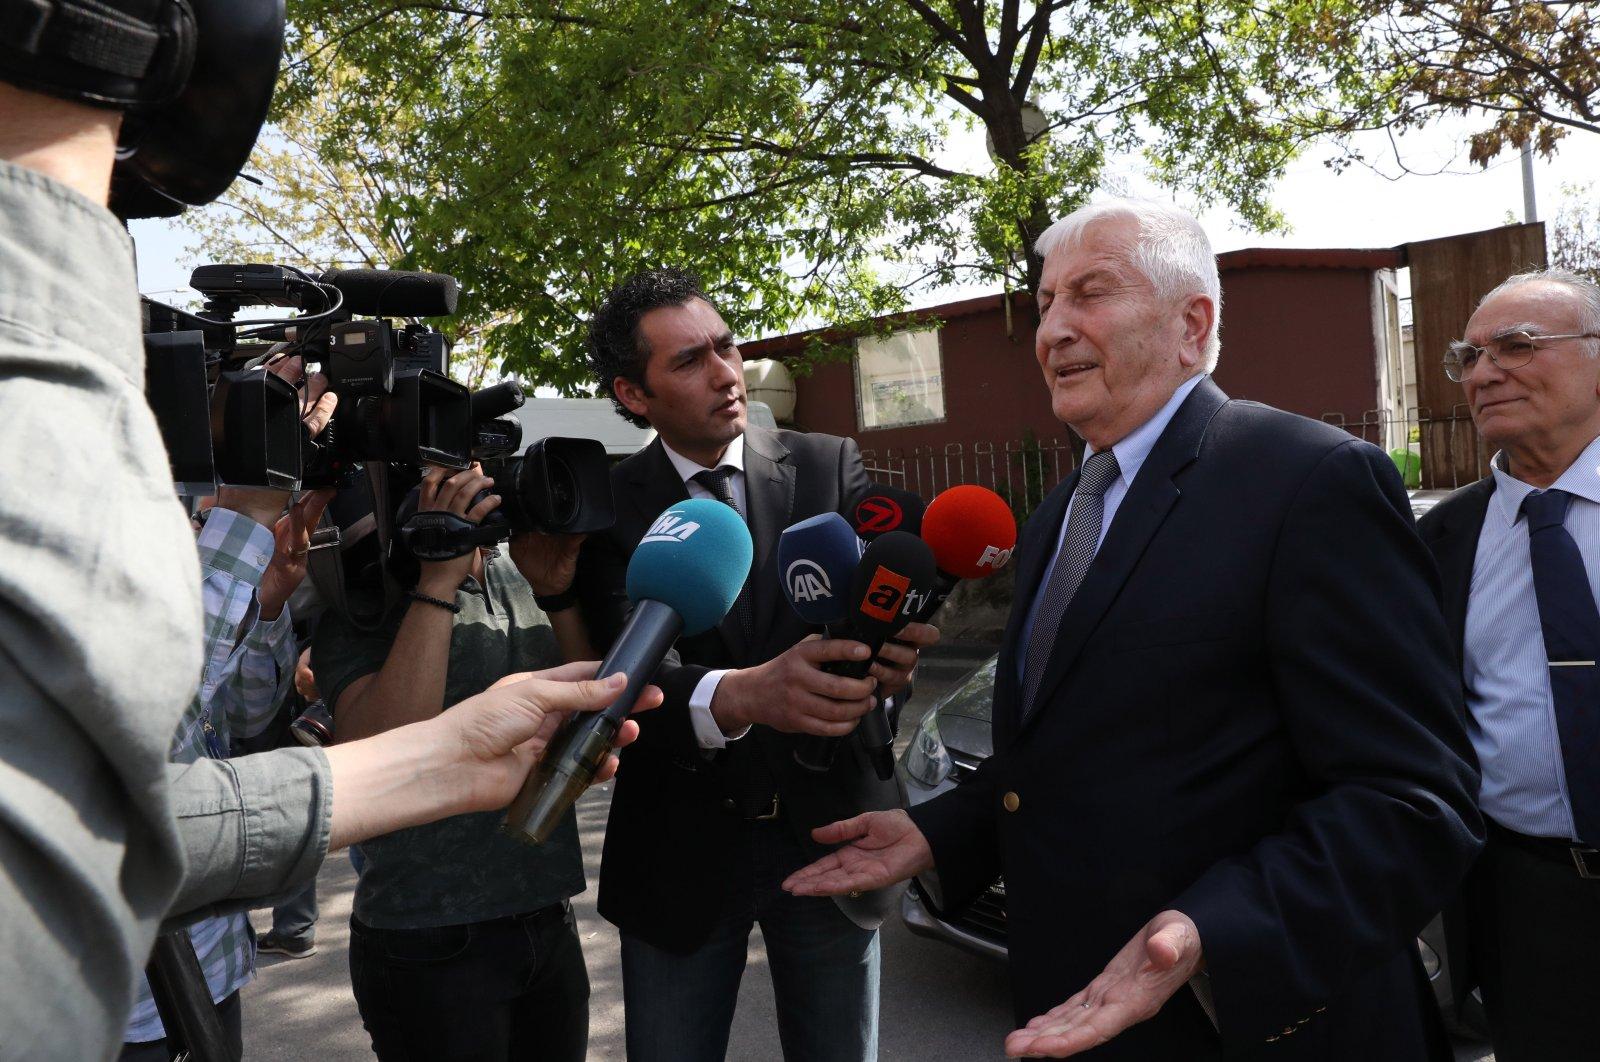 Former Gen. Çevik Bir speaks to reporters before a trial, in the capital Ankara, Turkey, April 13, 2018. (PHOTO BY ALİ EKEYILMAZ)